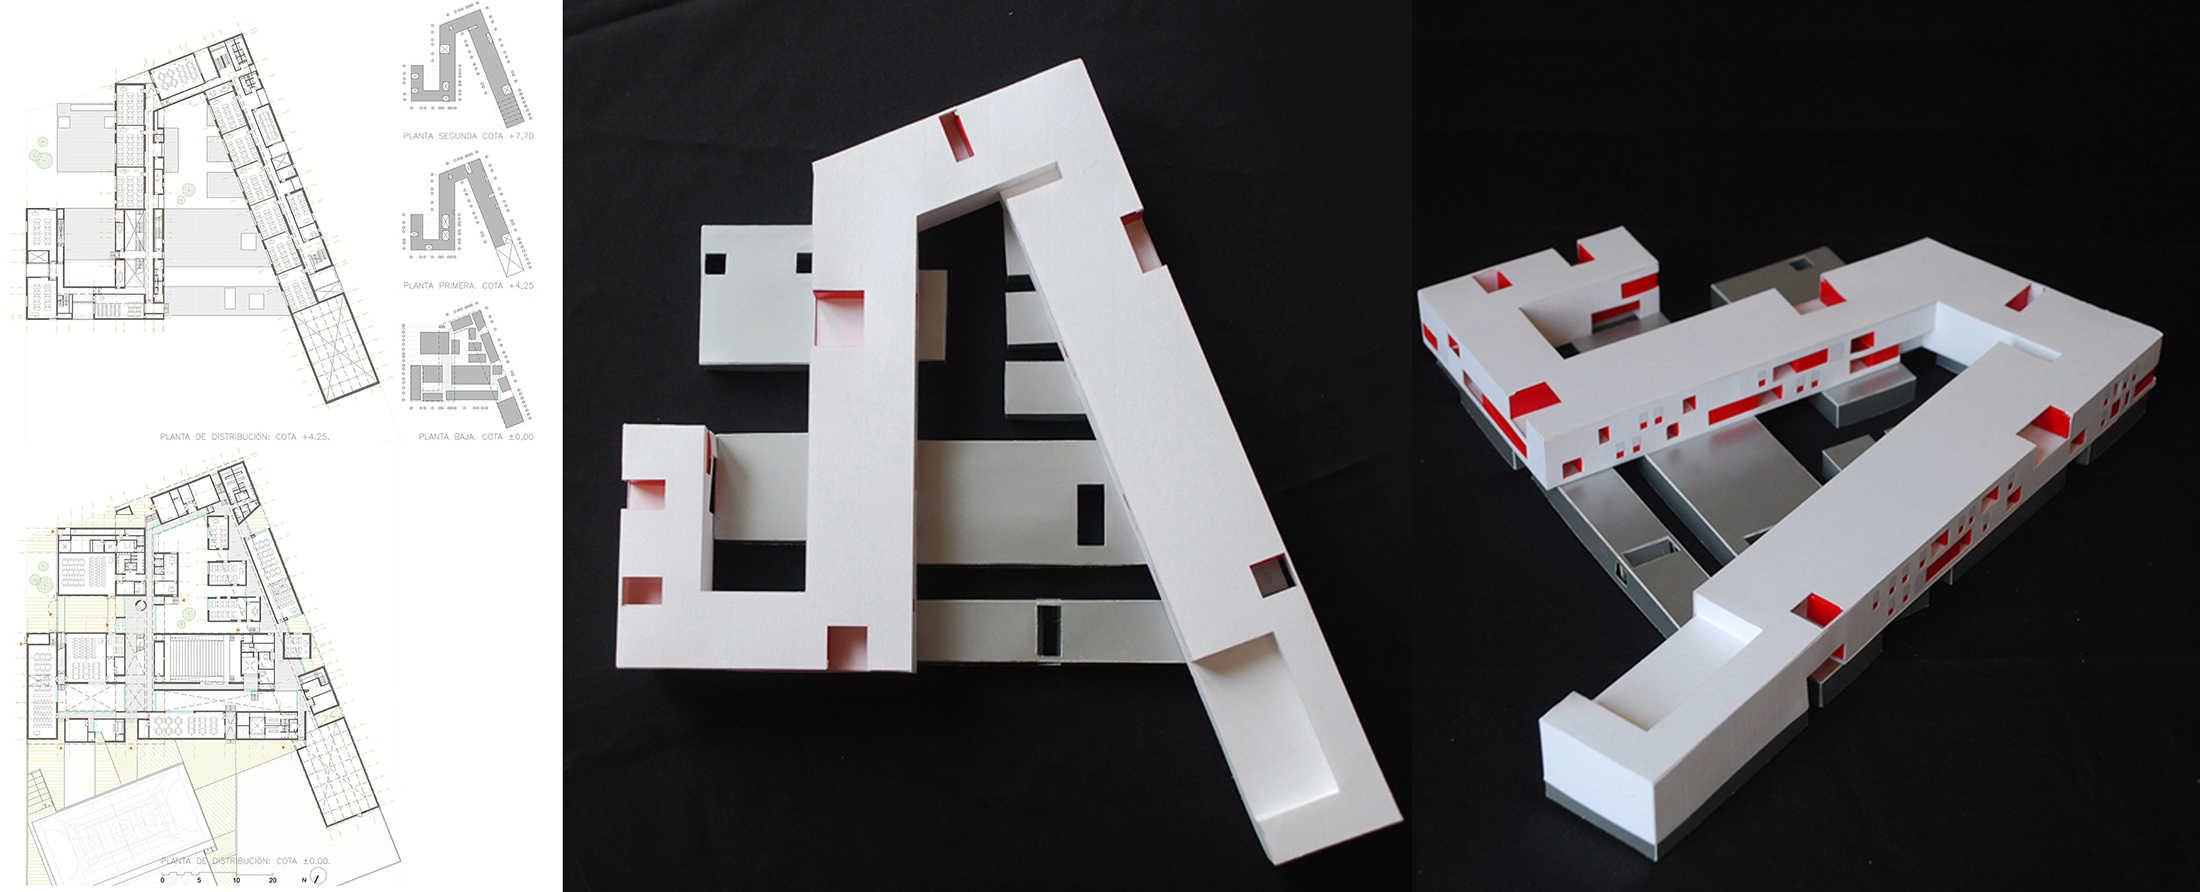 IES Coria - maqueta - arquitectura escolar - LANDÍNEZ+REY | eL2Gaa